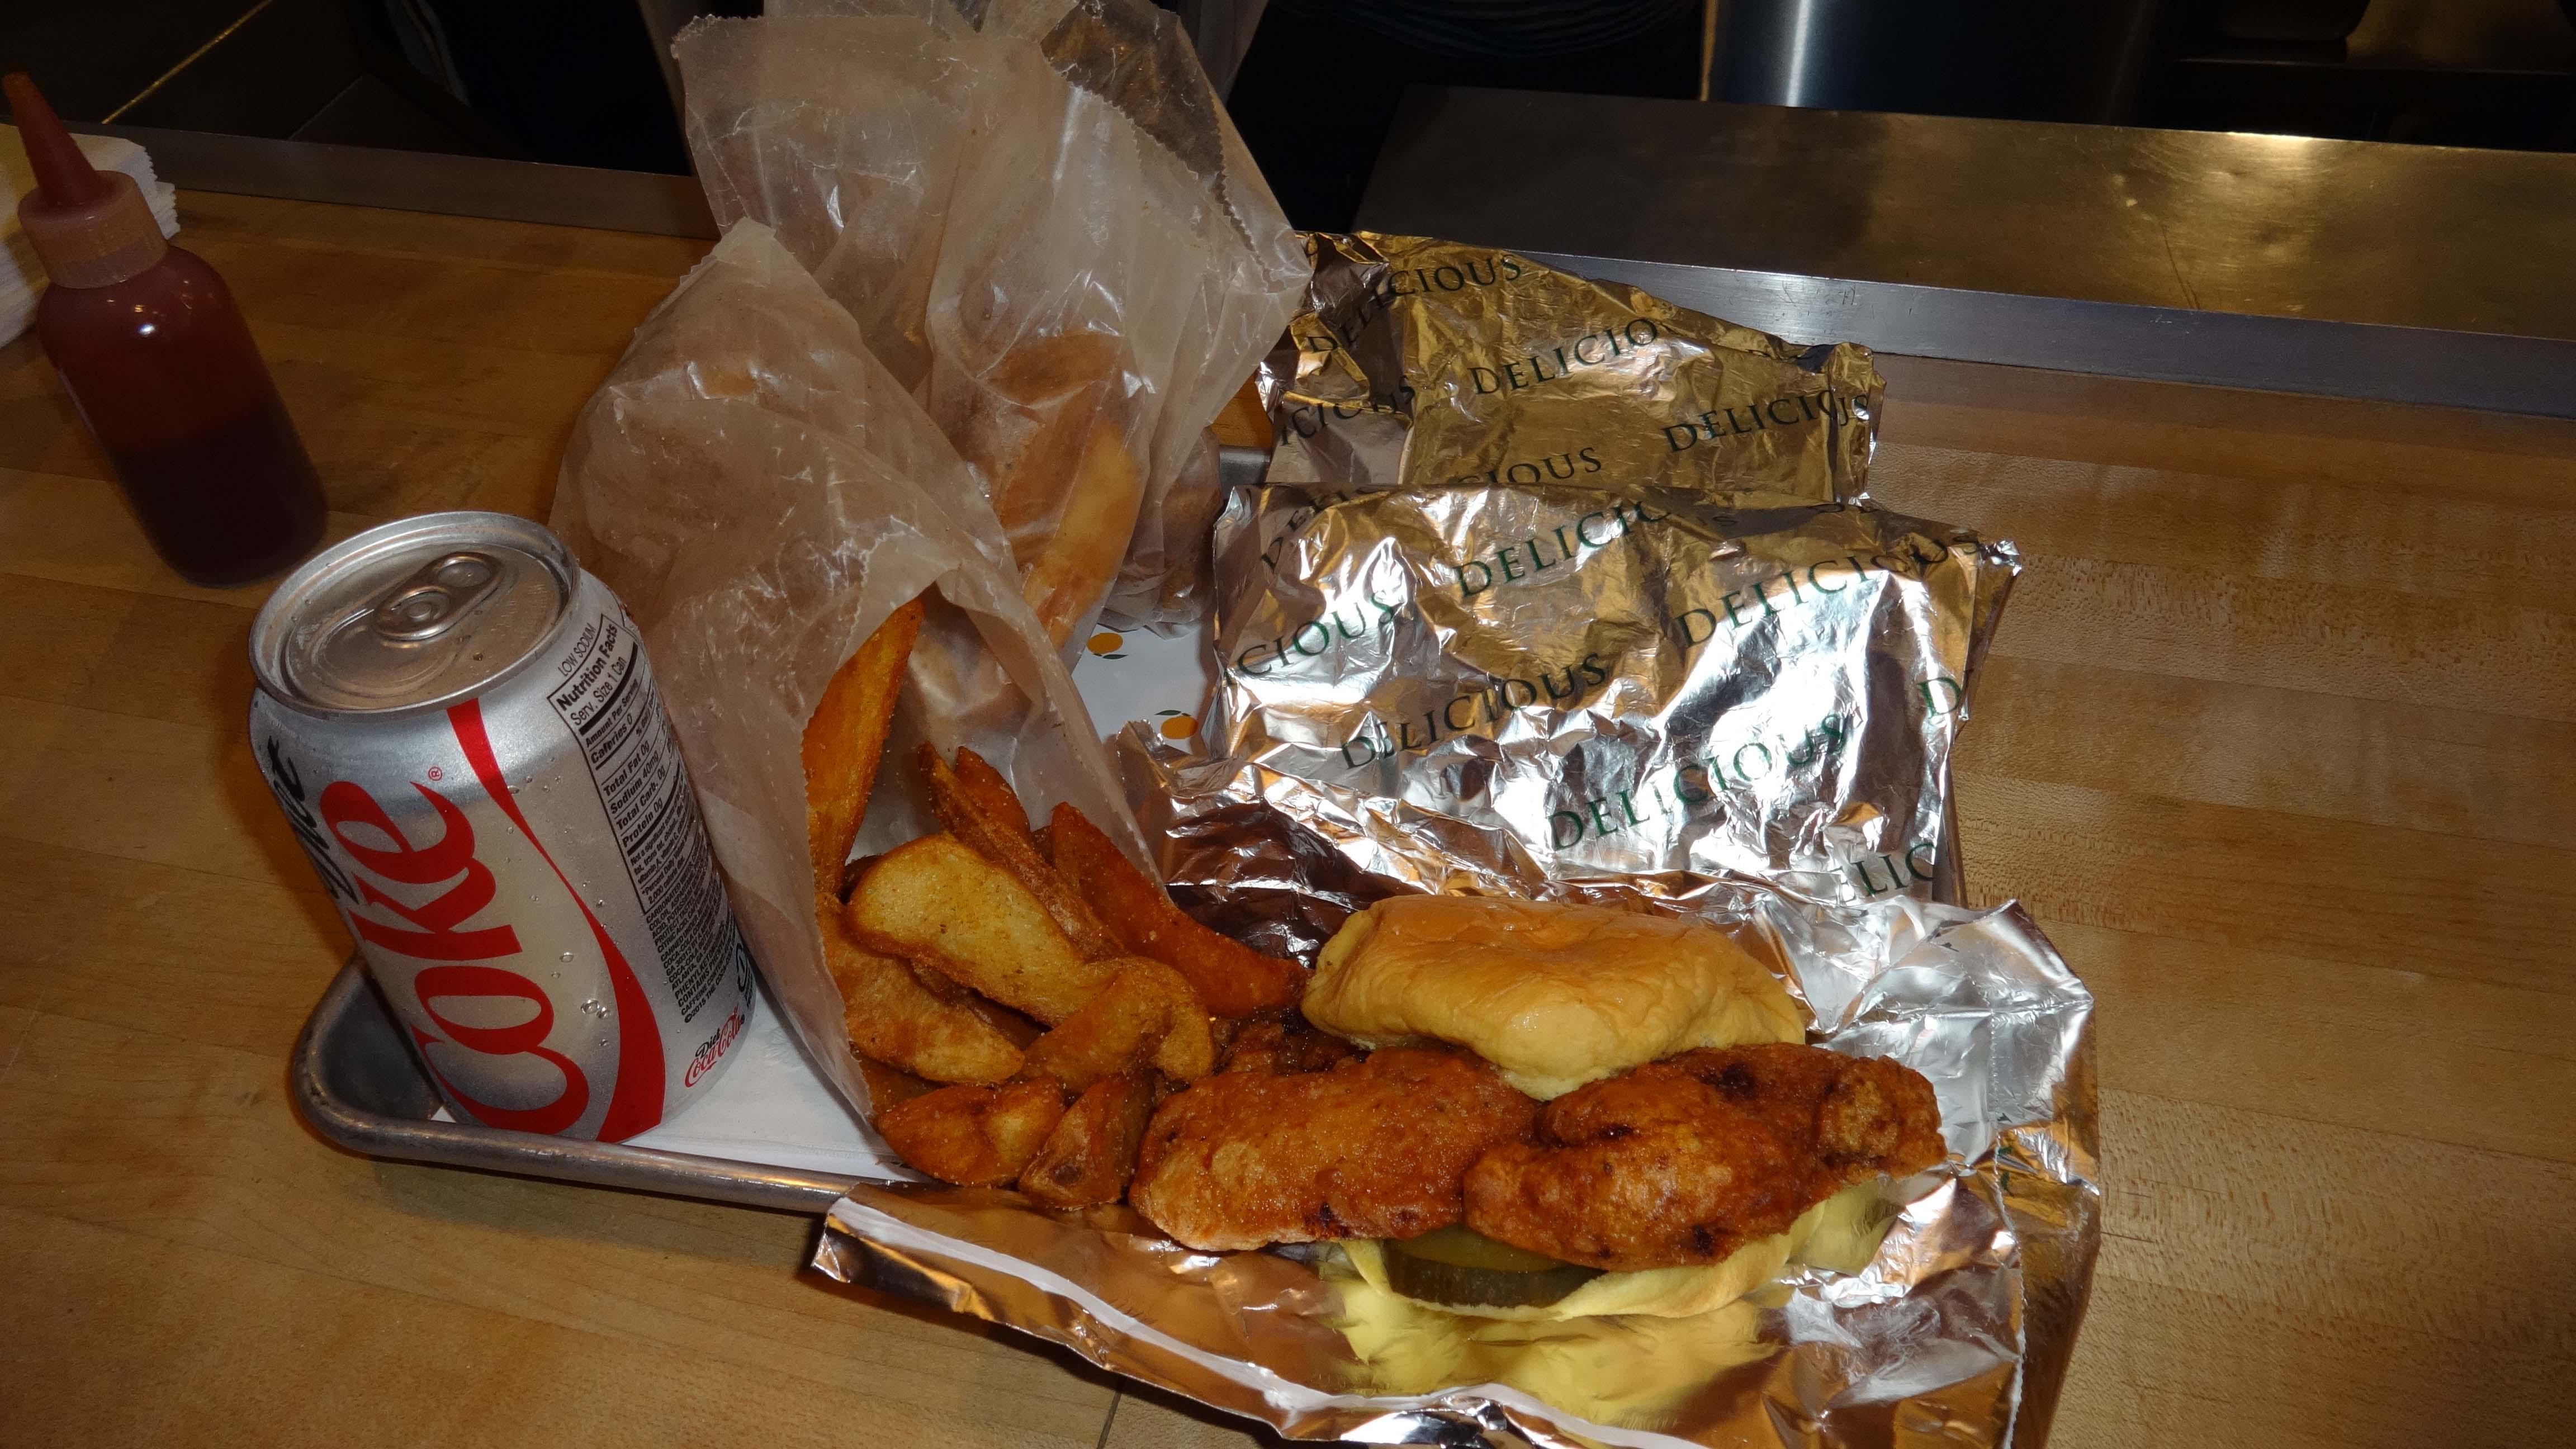 Fuku fired chicken sandwich